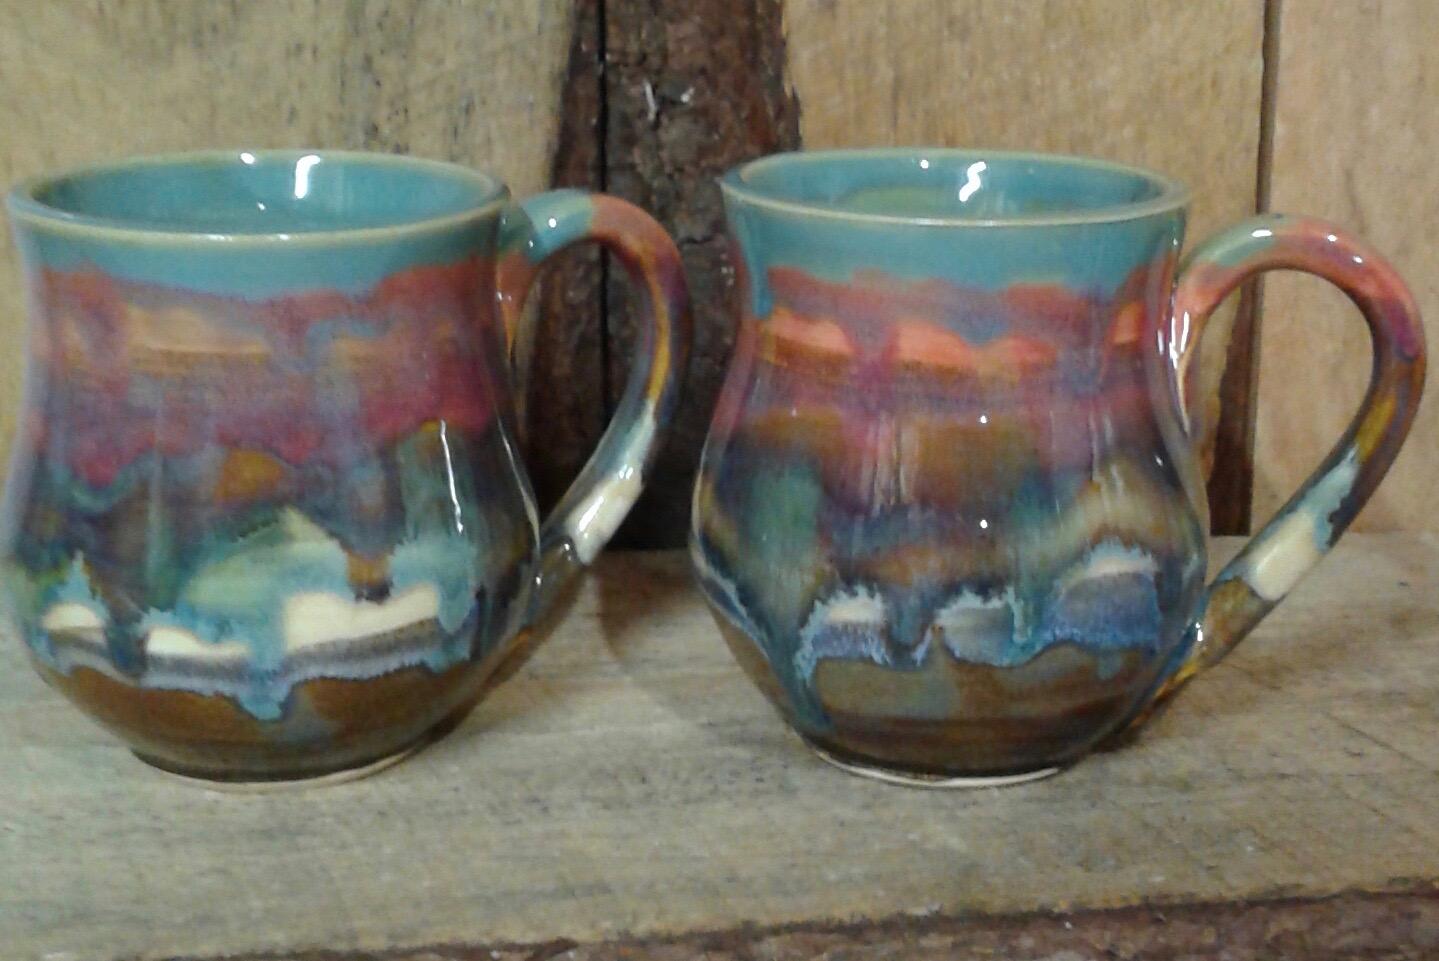 schnortzy's pottery